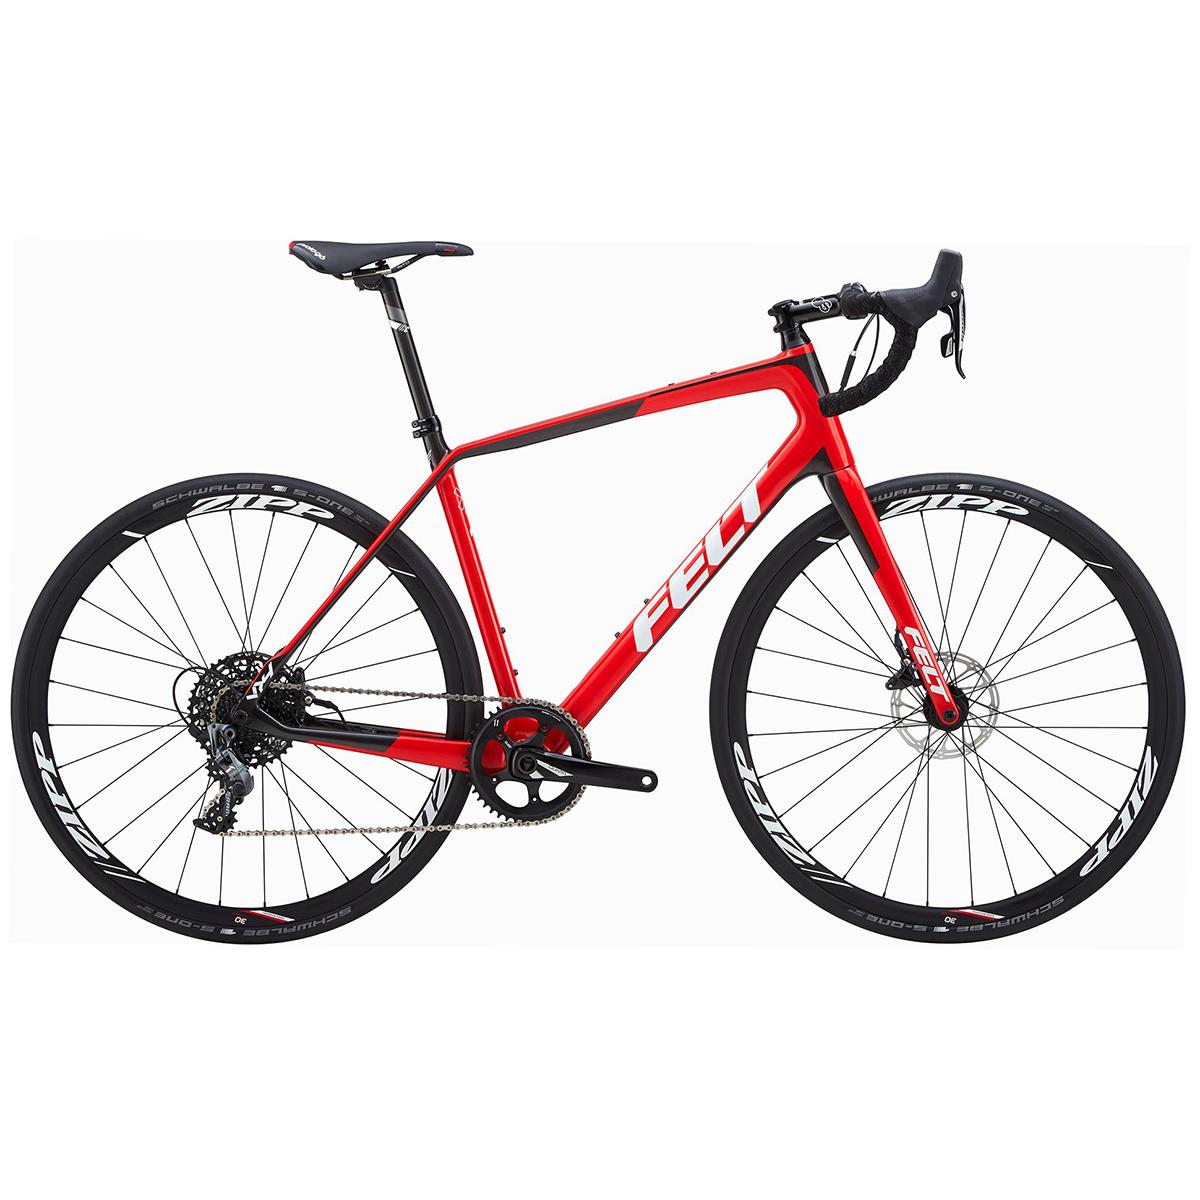 Felt VR4 Rival 1 Carbon Disc Road Bike £1549 @ Merlin Cycles